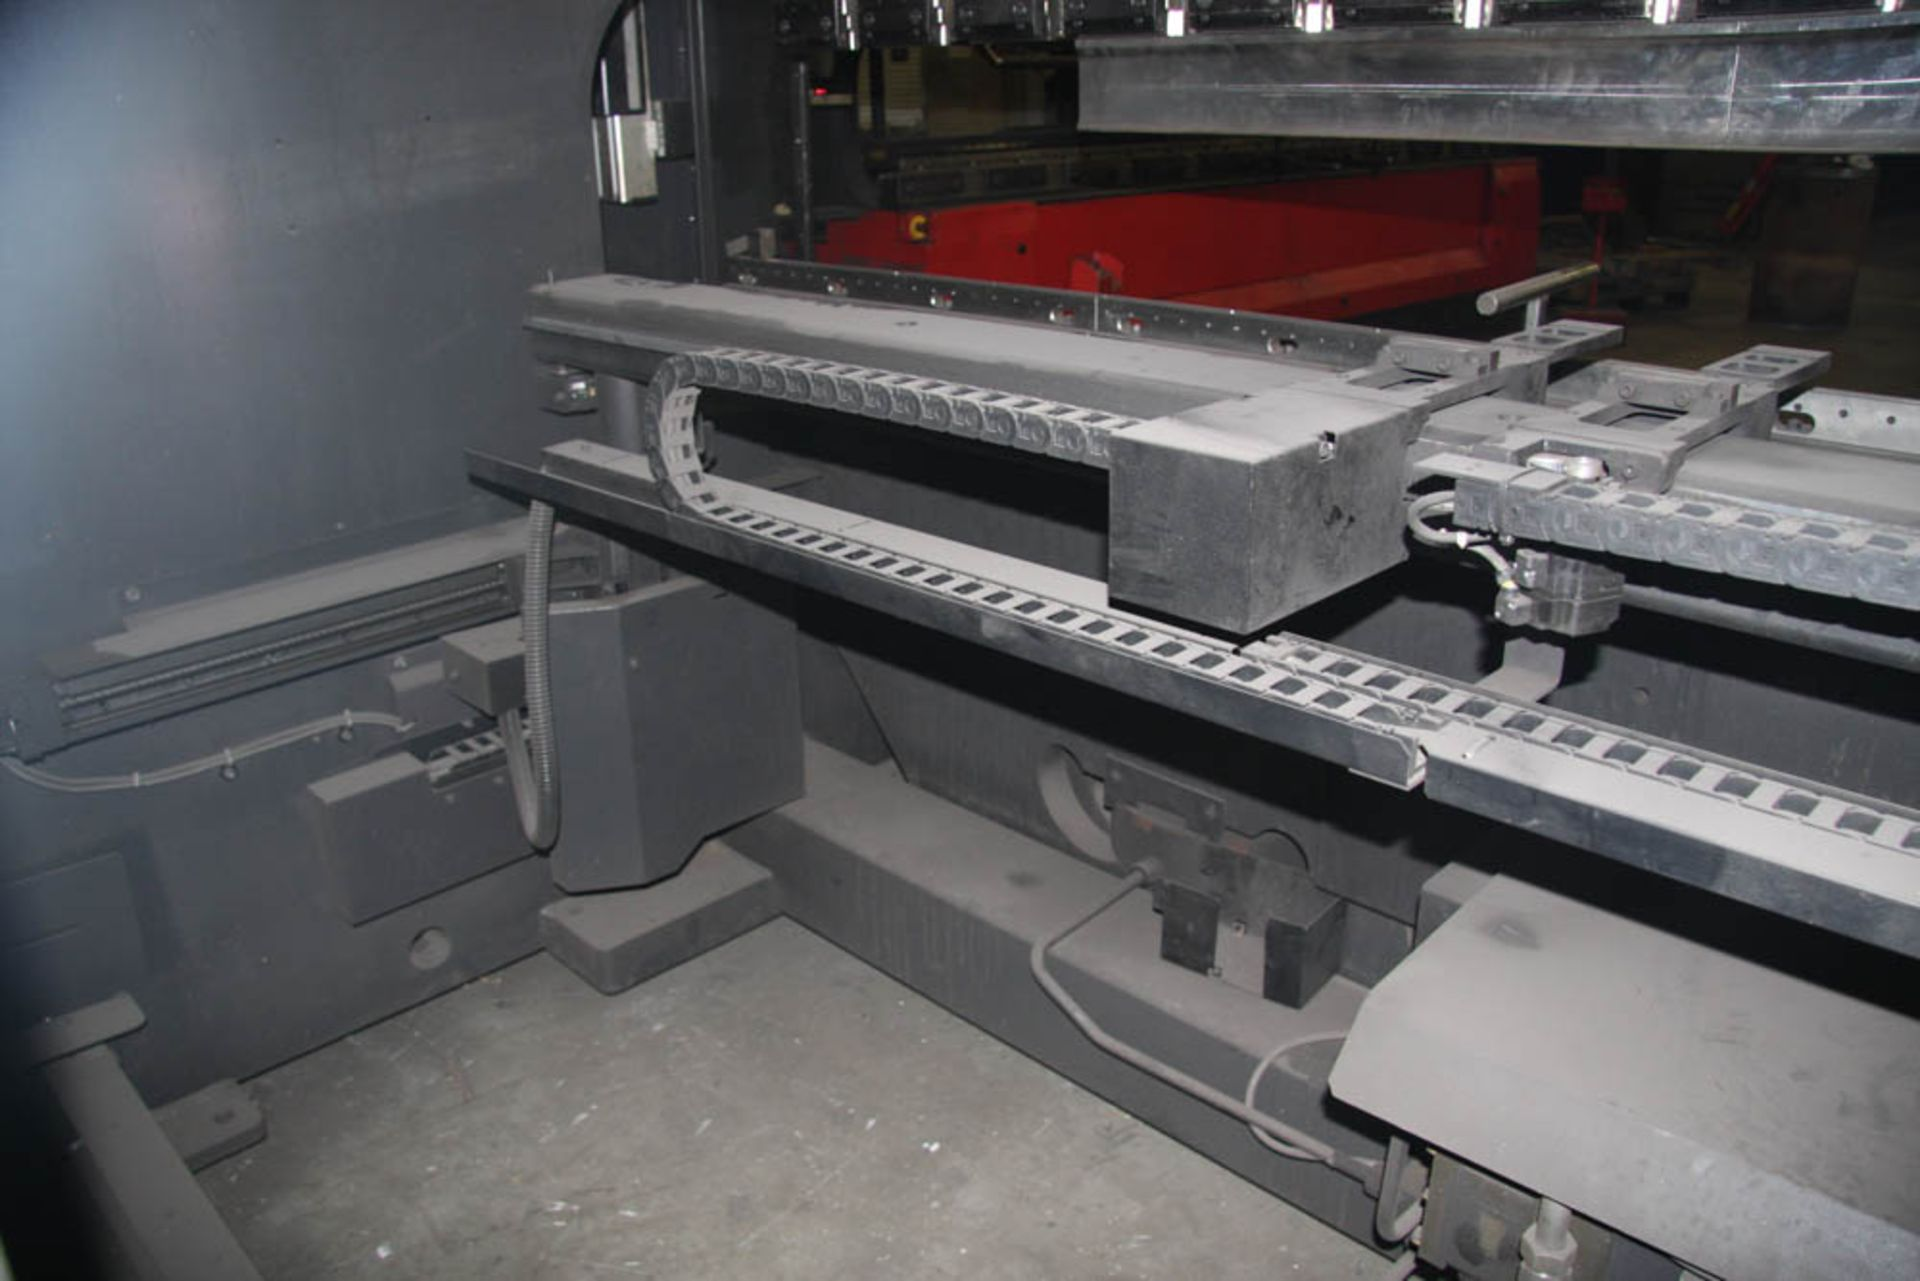 "2015 187 US TON X 122"" AMADA MDL. HG1703 CNC PRESS BRAKE, AMNC 3i CONTROL, 122"" MAX BEND LENGTH - Image 11 of 14"